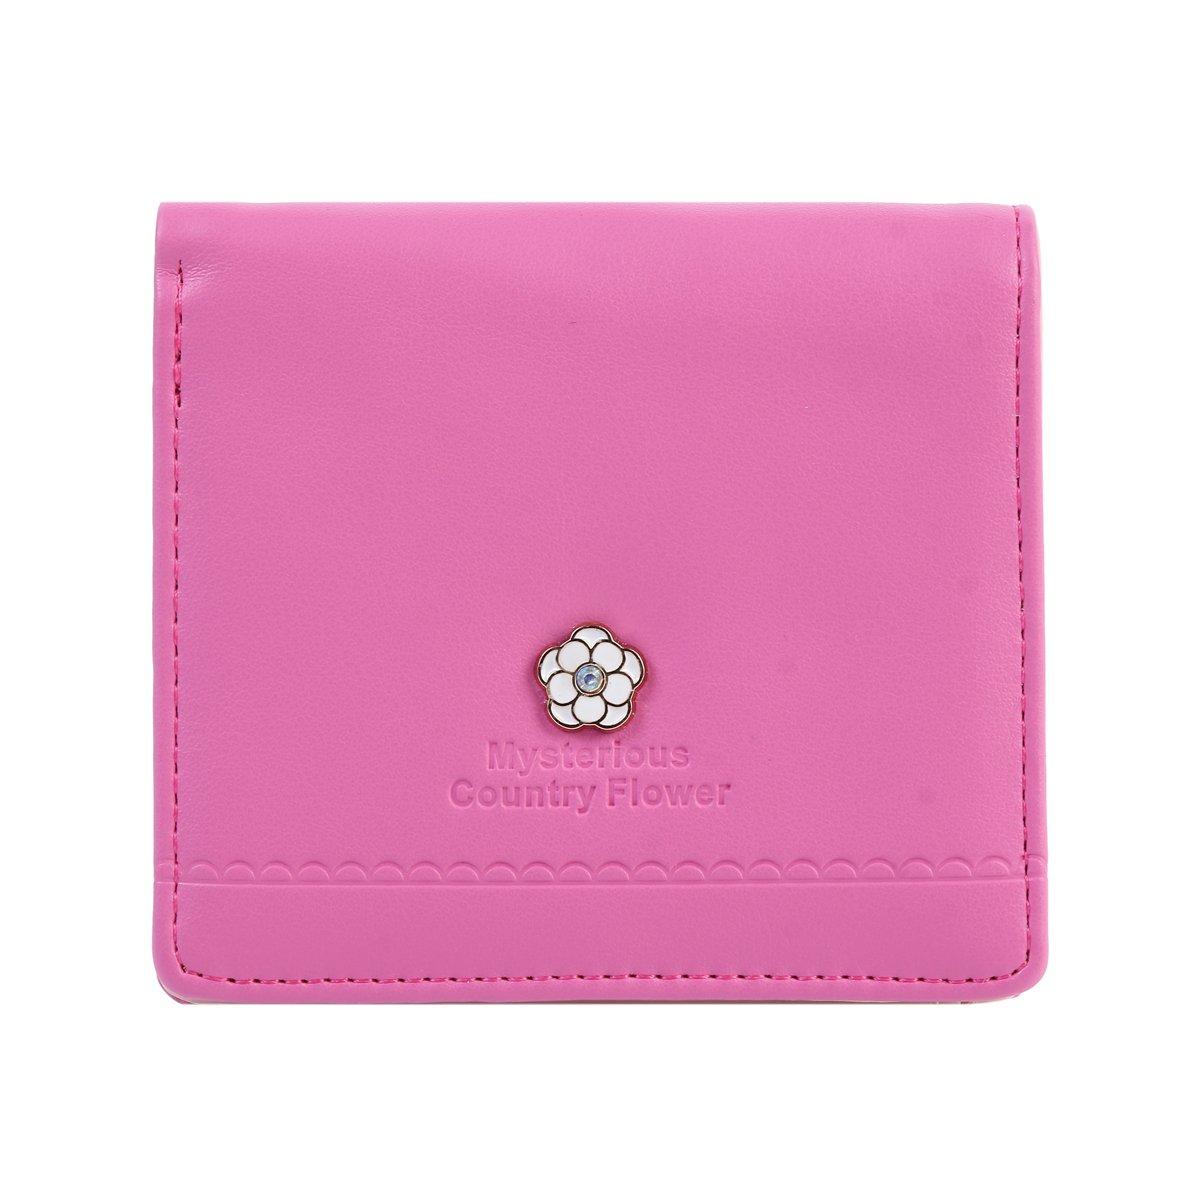 Damara ガールズ 花柄 財布 お札入れ カードケース 小型  レッド B018S2XJL8